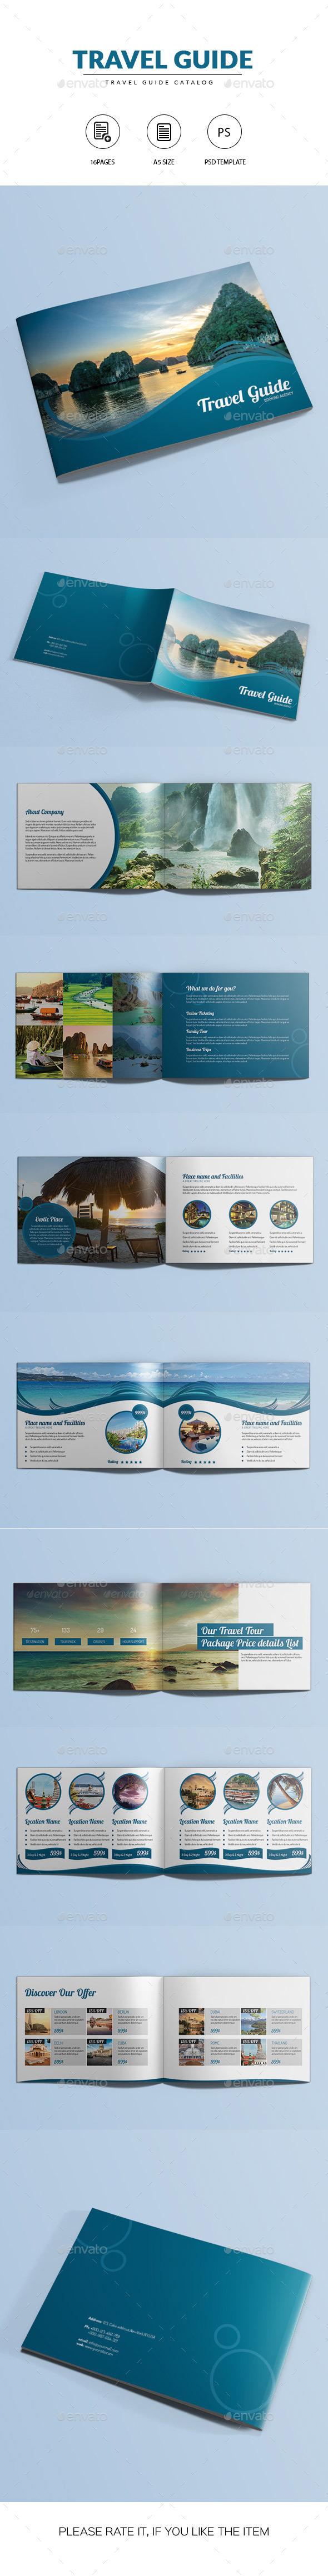 Travel Guide Catalog/Brochure - Catalogs Brochures